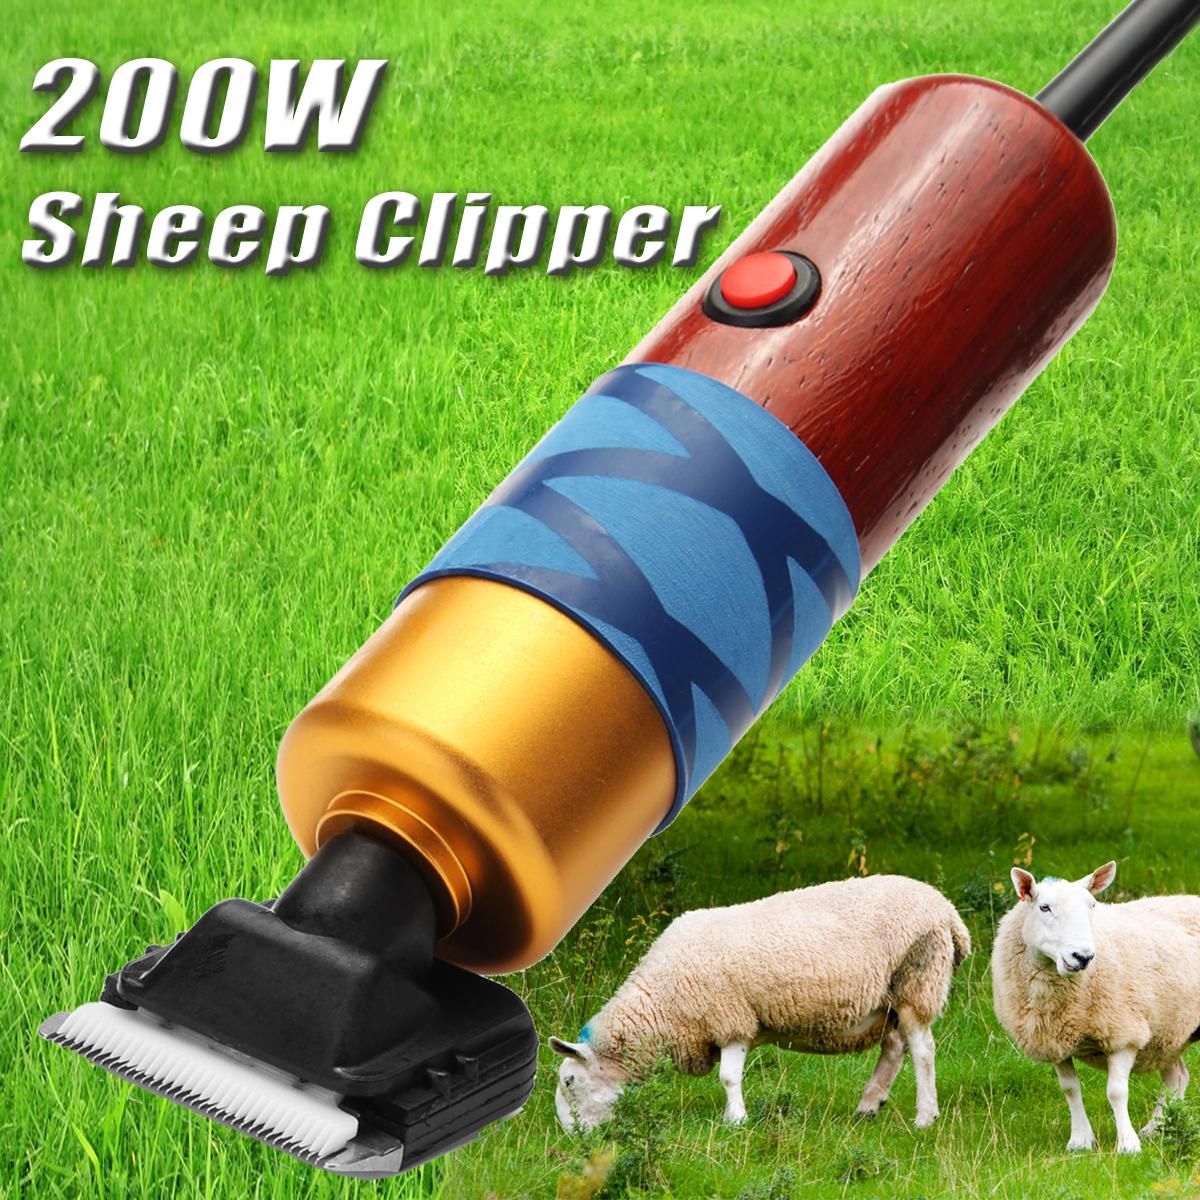 200W Sheep Clipper Professional Собака Уход Набор Для кролика Pet Собака Уход Набор